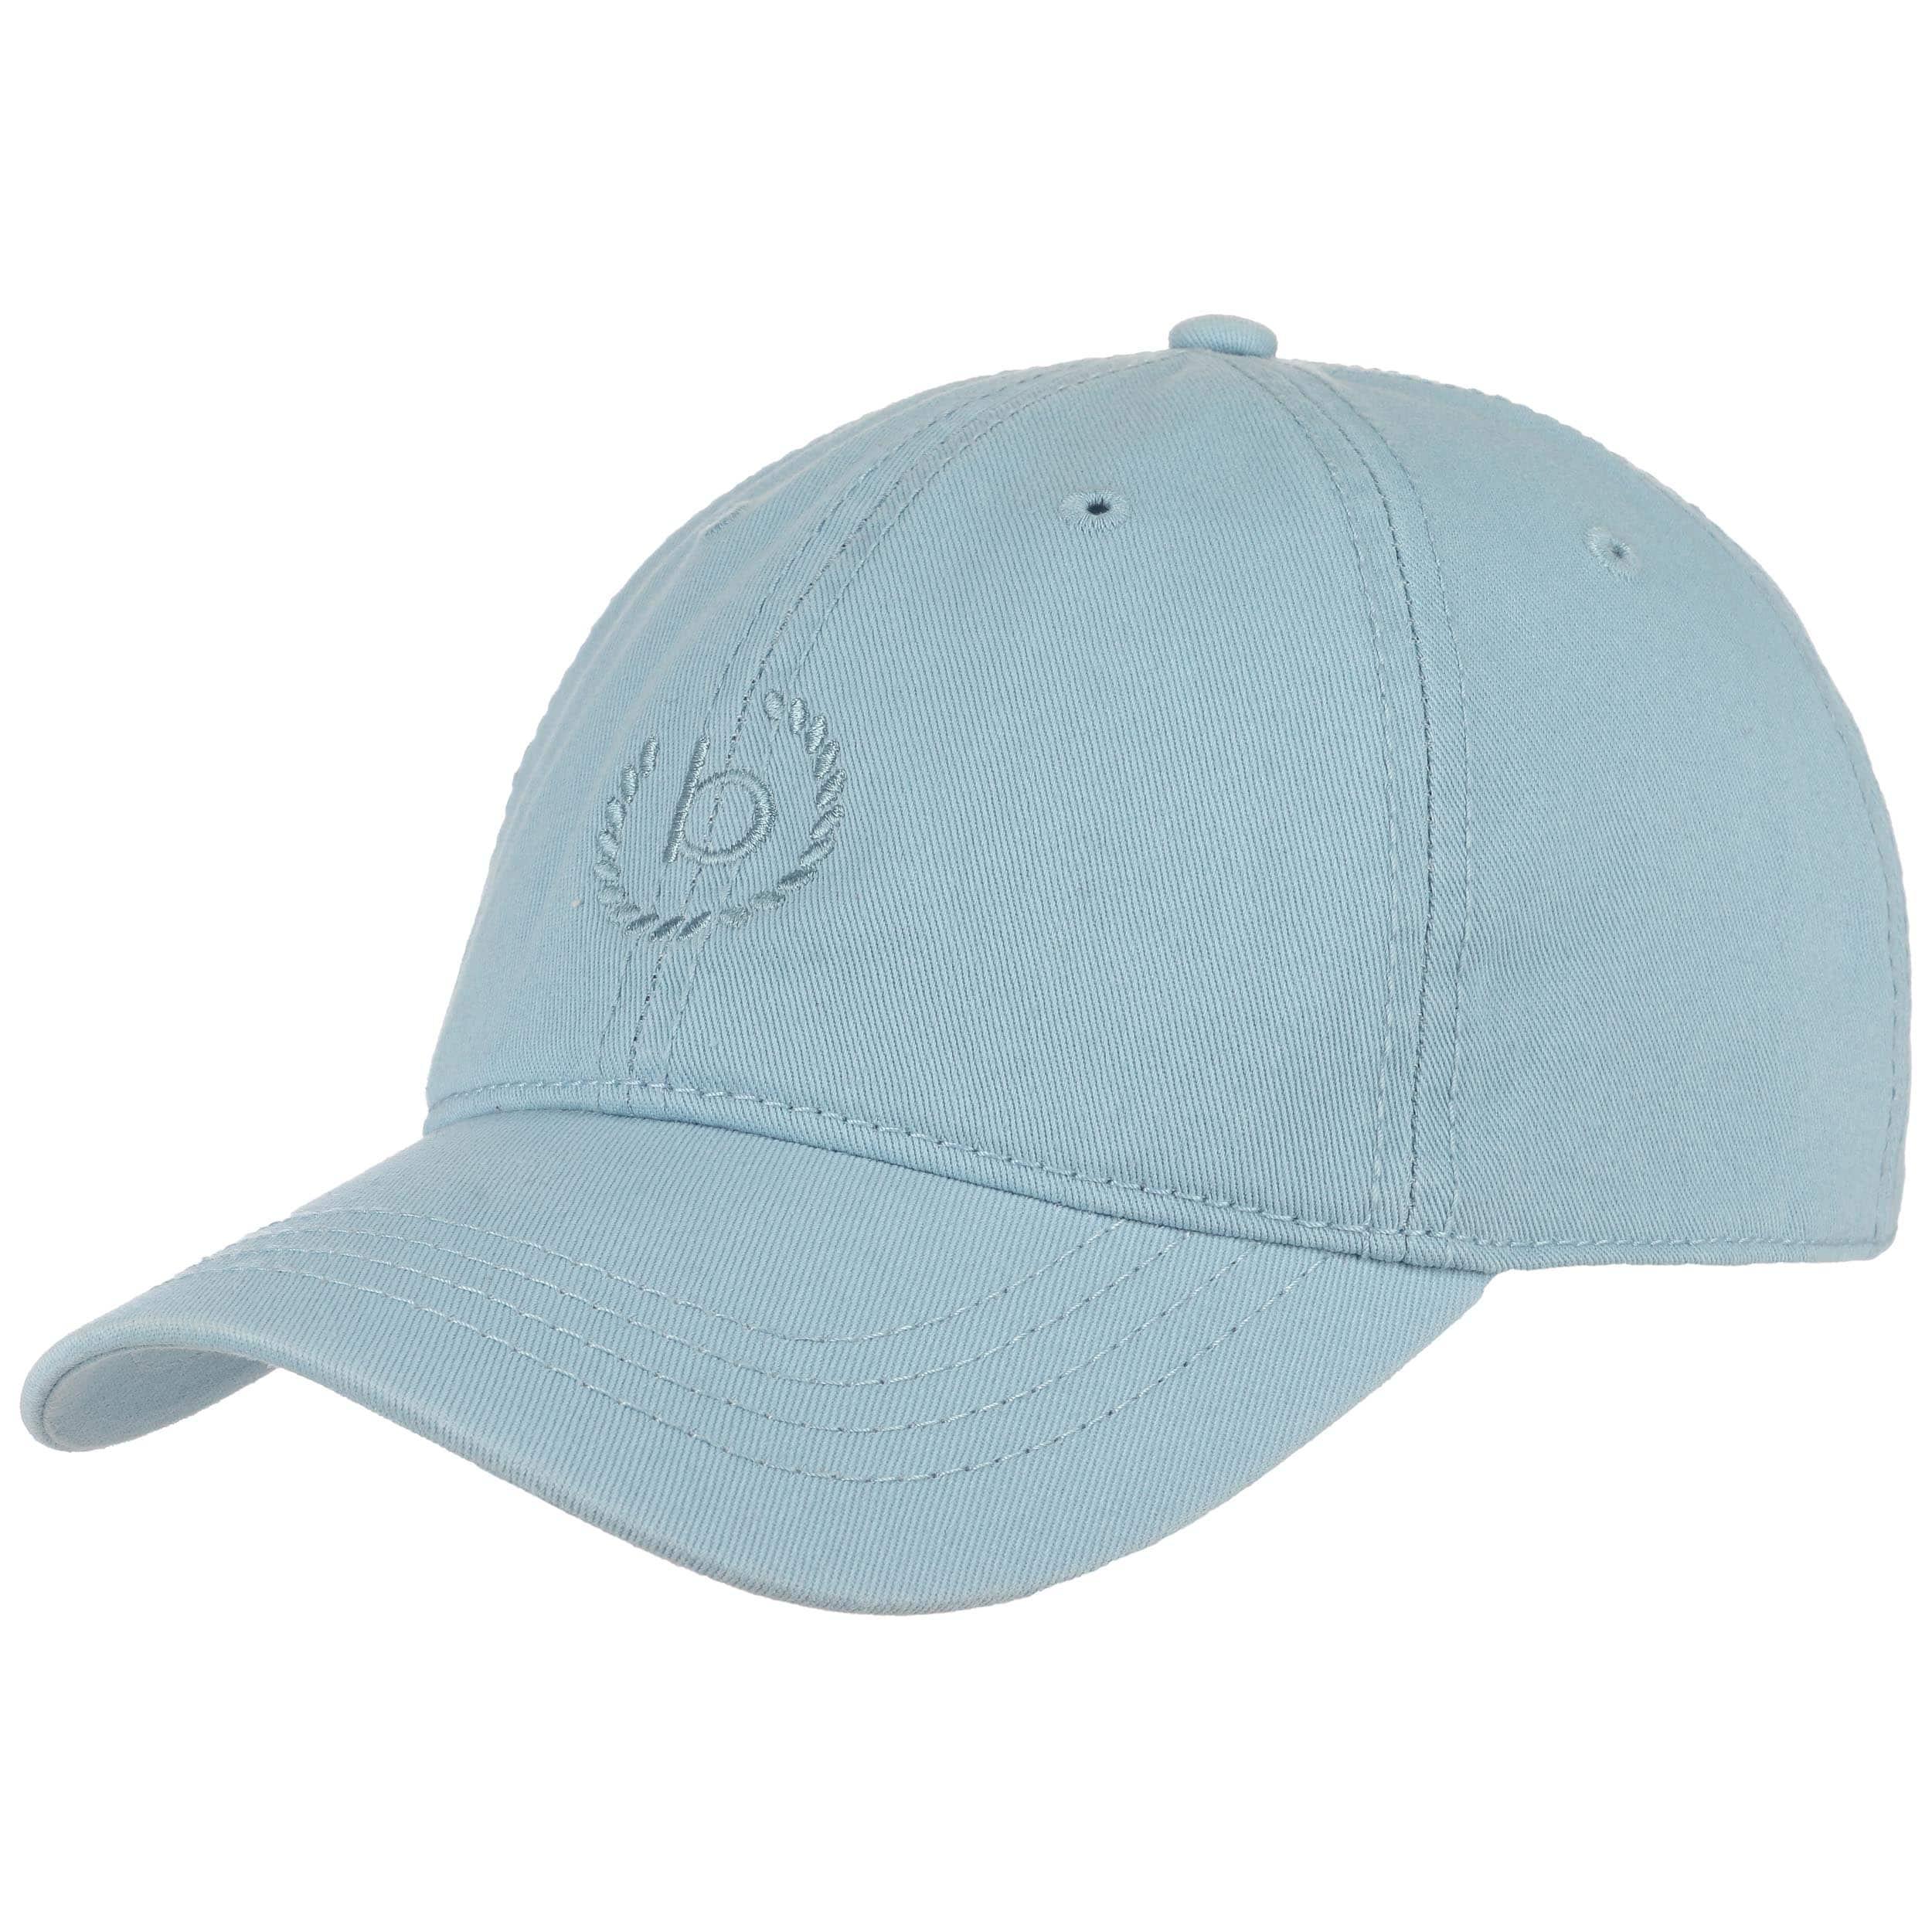 ac913458ba2 Uni Classic Cotton Baseball Cap. by bugatti